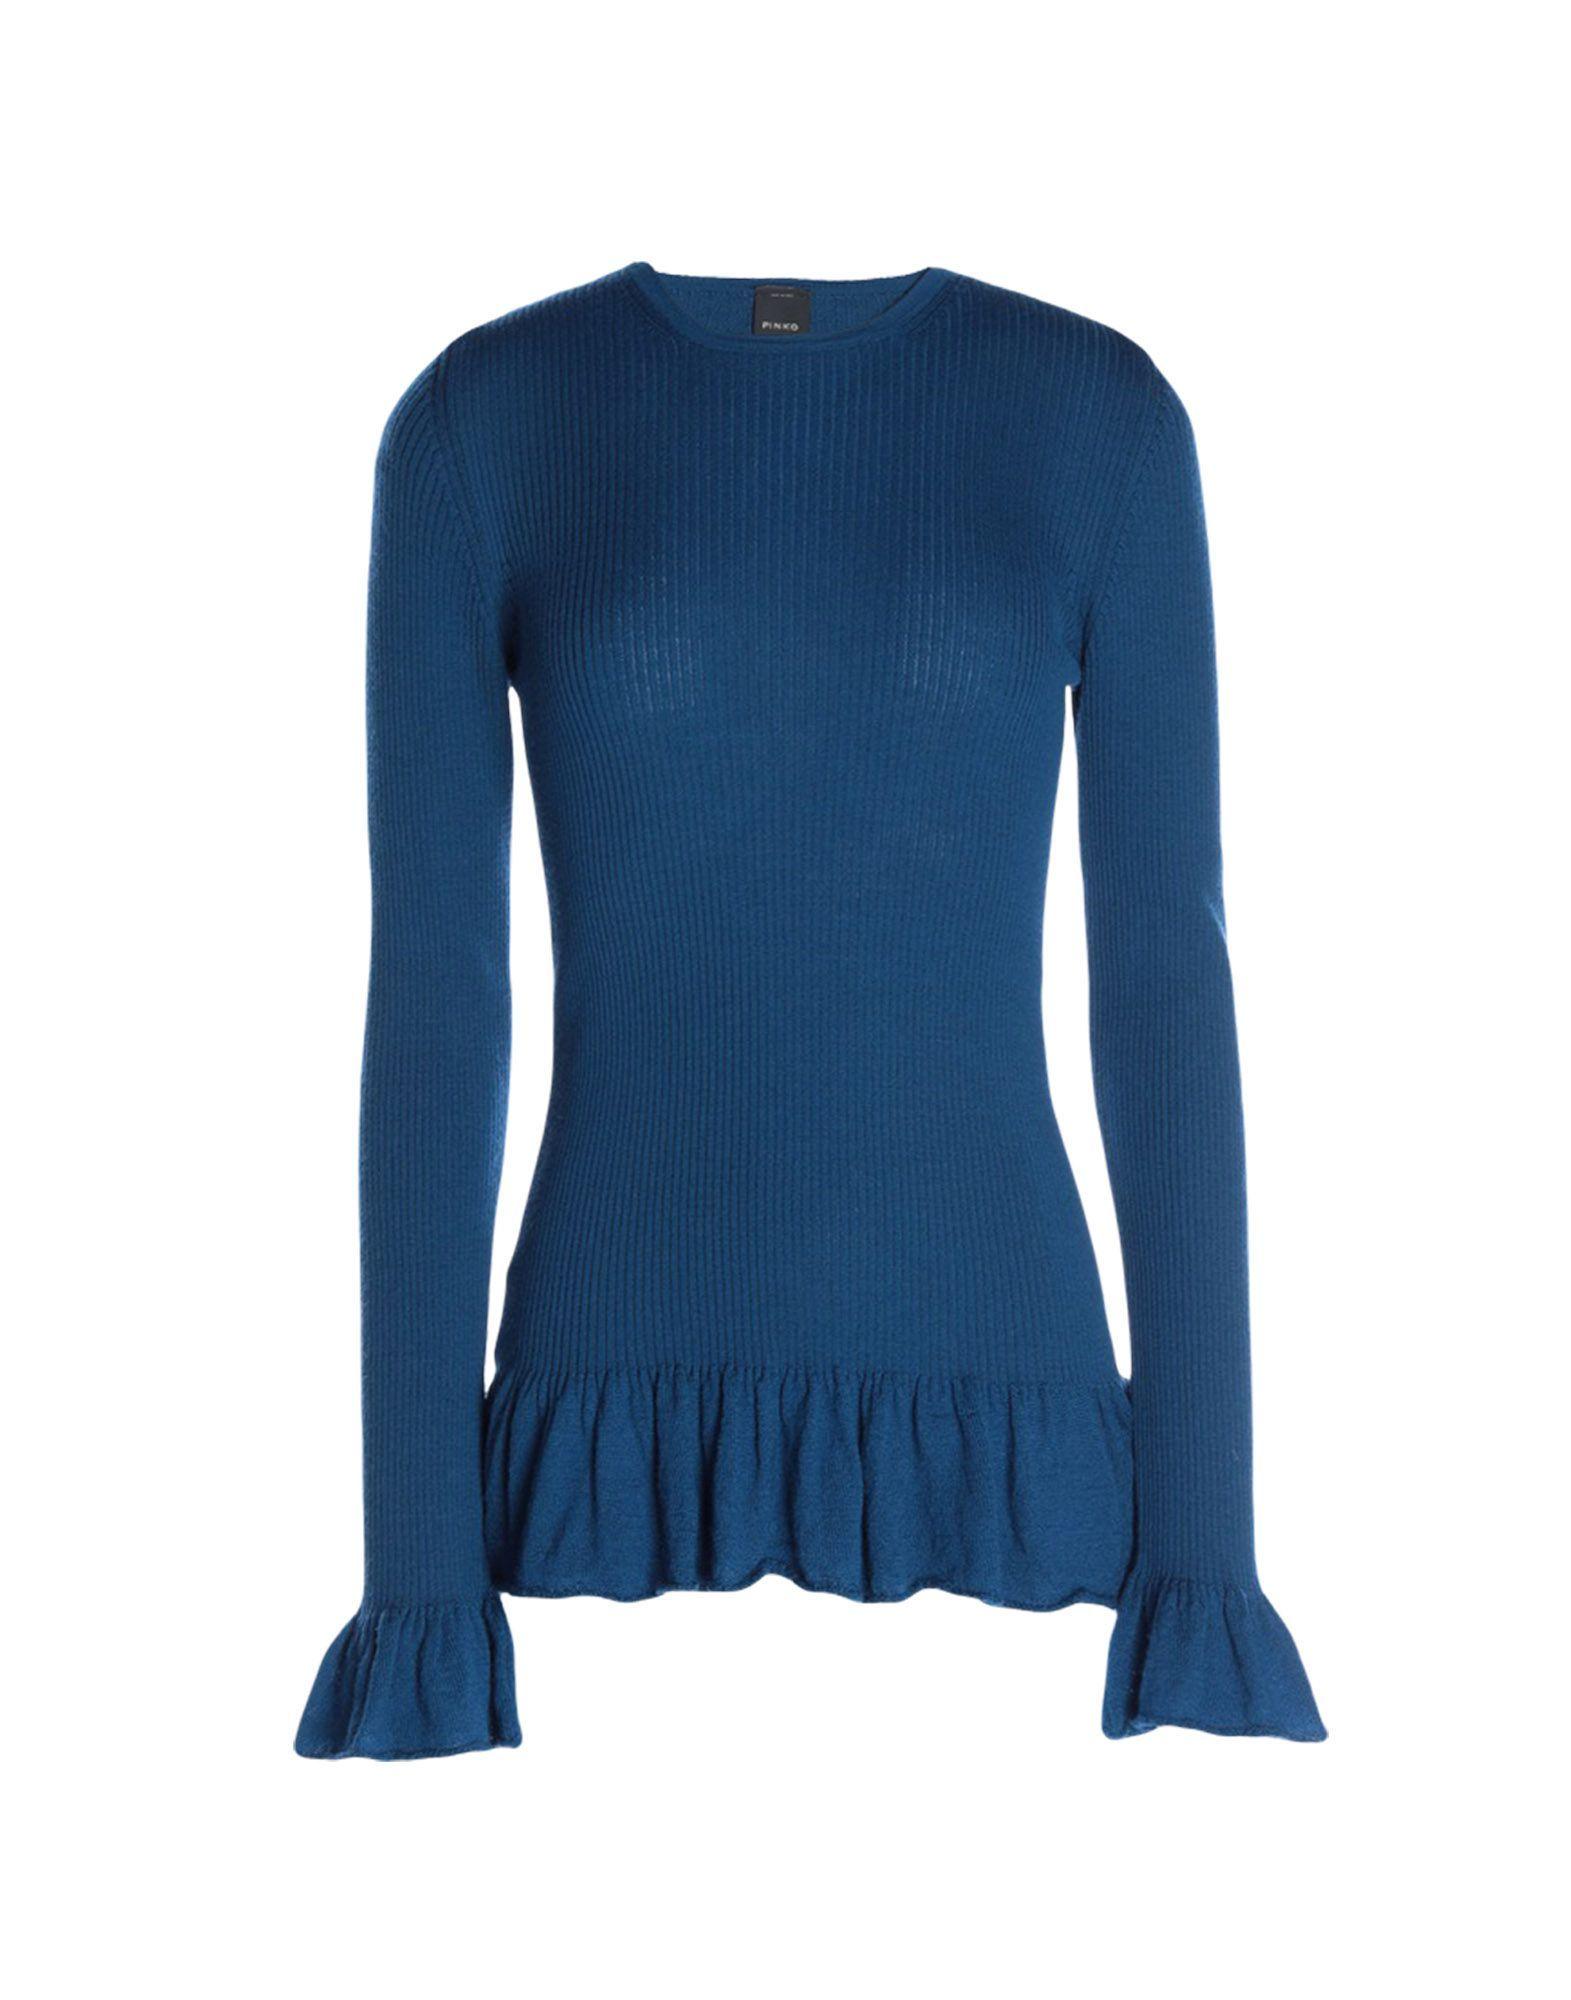 Pinko Blue Wool Ruffle Jumper